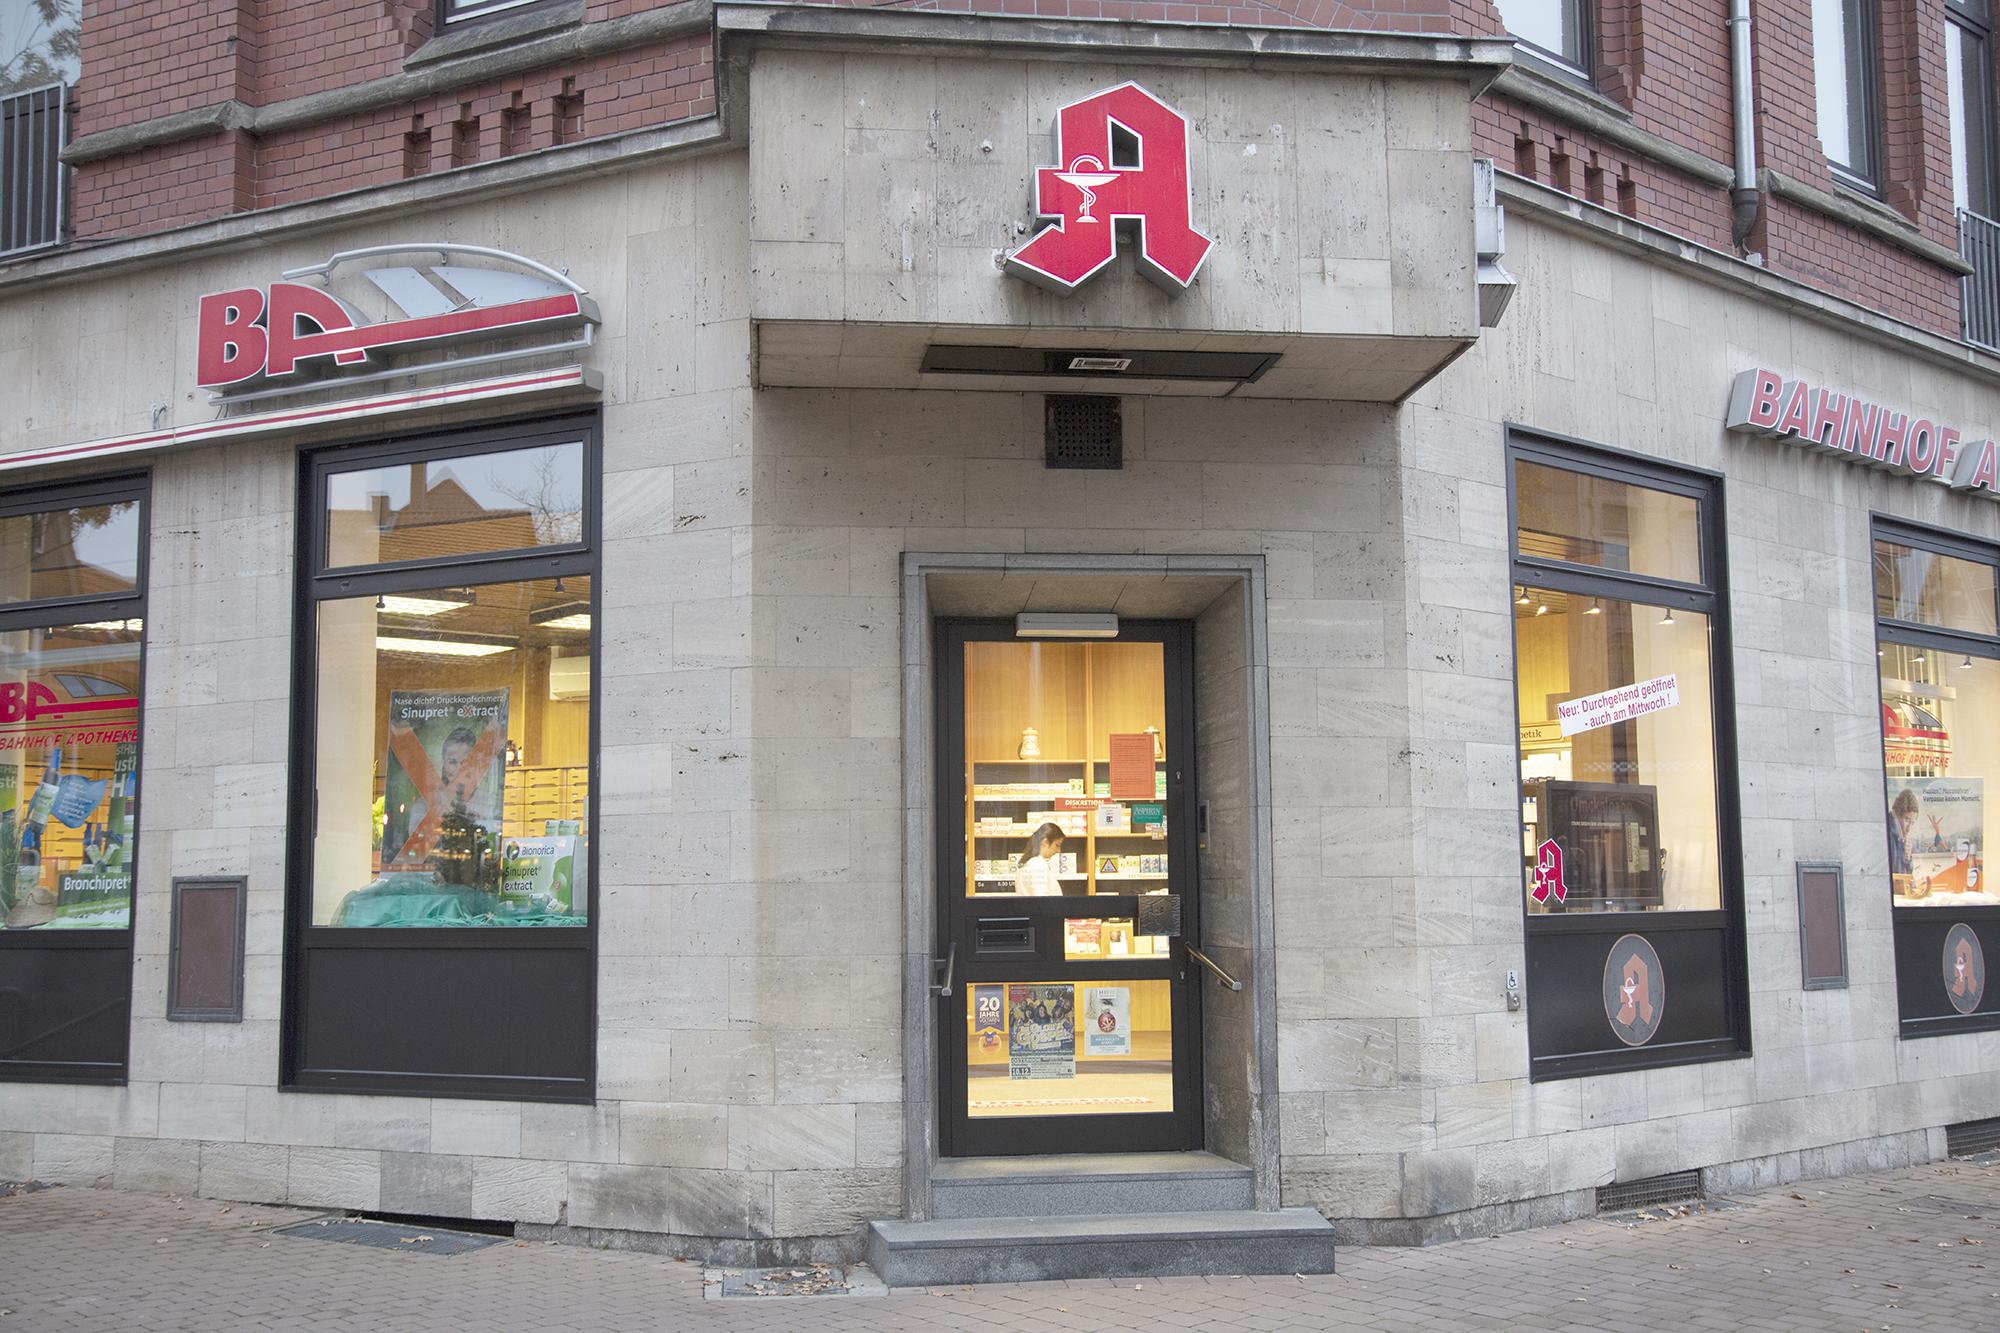 Ihre Bahnhof-Apotheke in Osterode background image